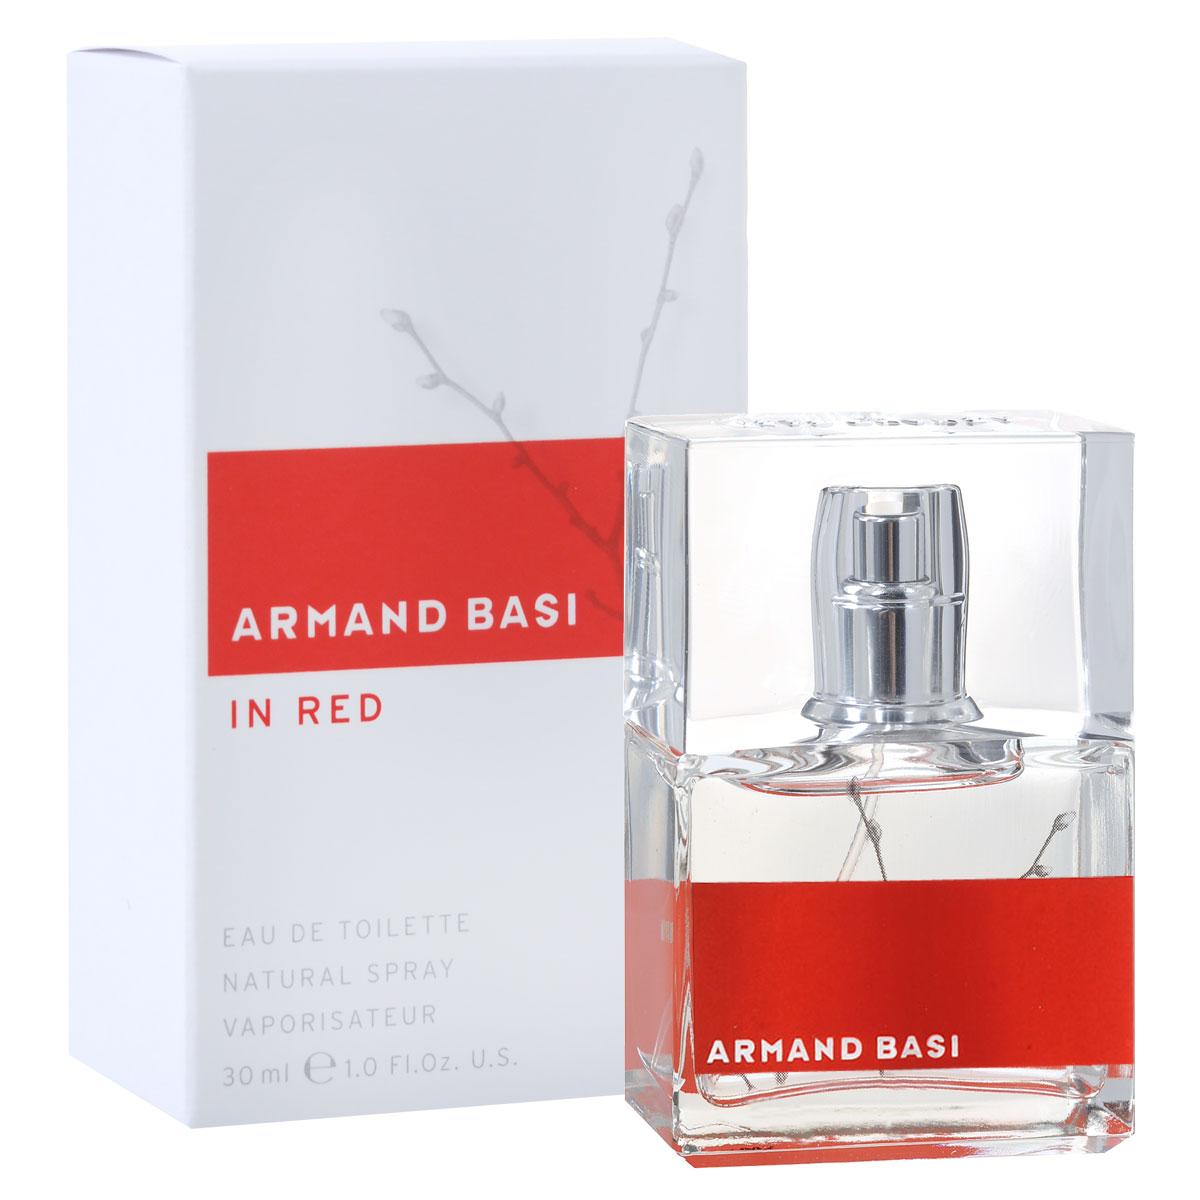 Armand Basi Туалетная вода In Red, женская, 30 мл49194